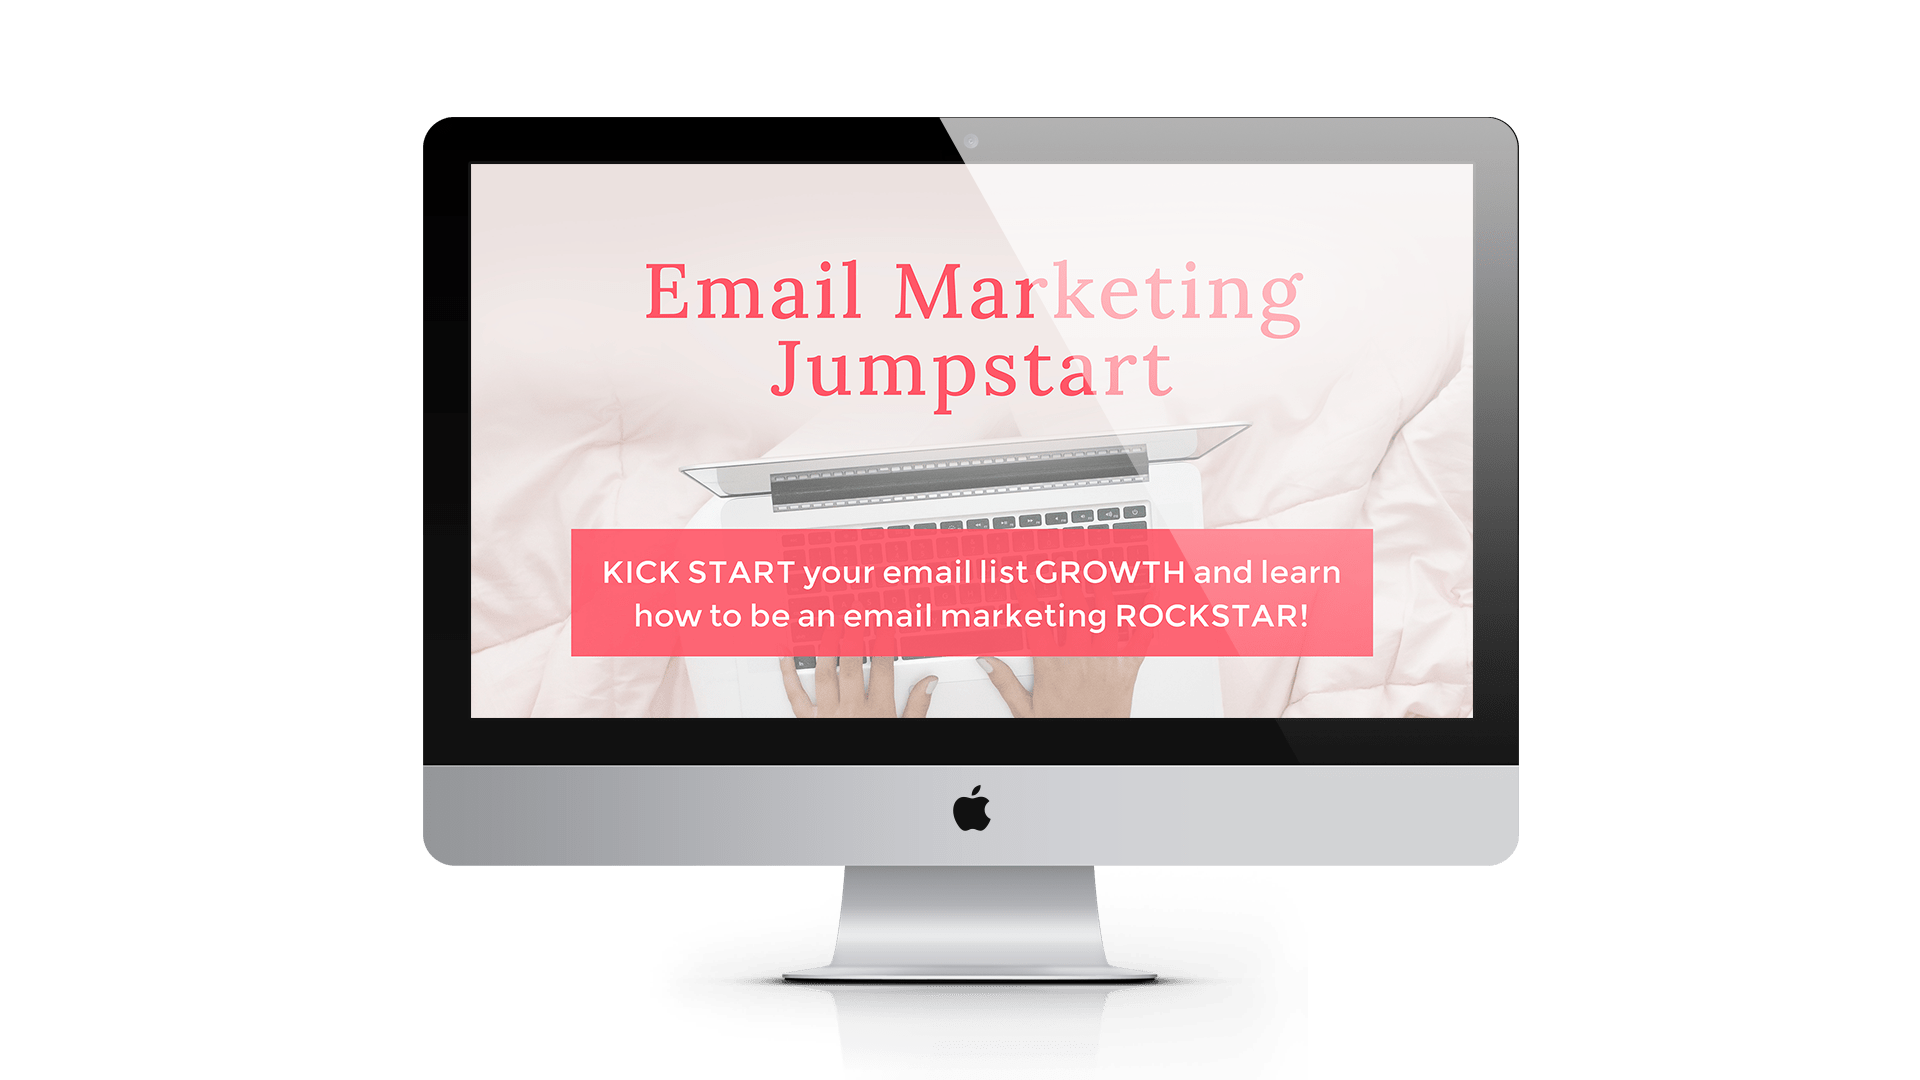 Email Marketing Jumpstart